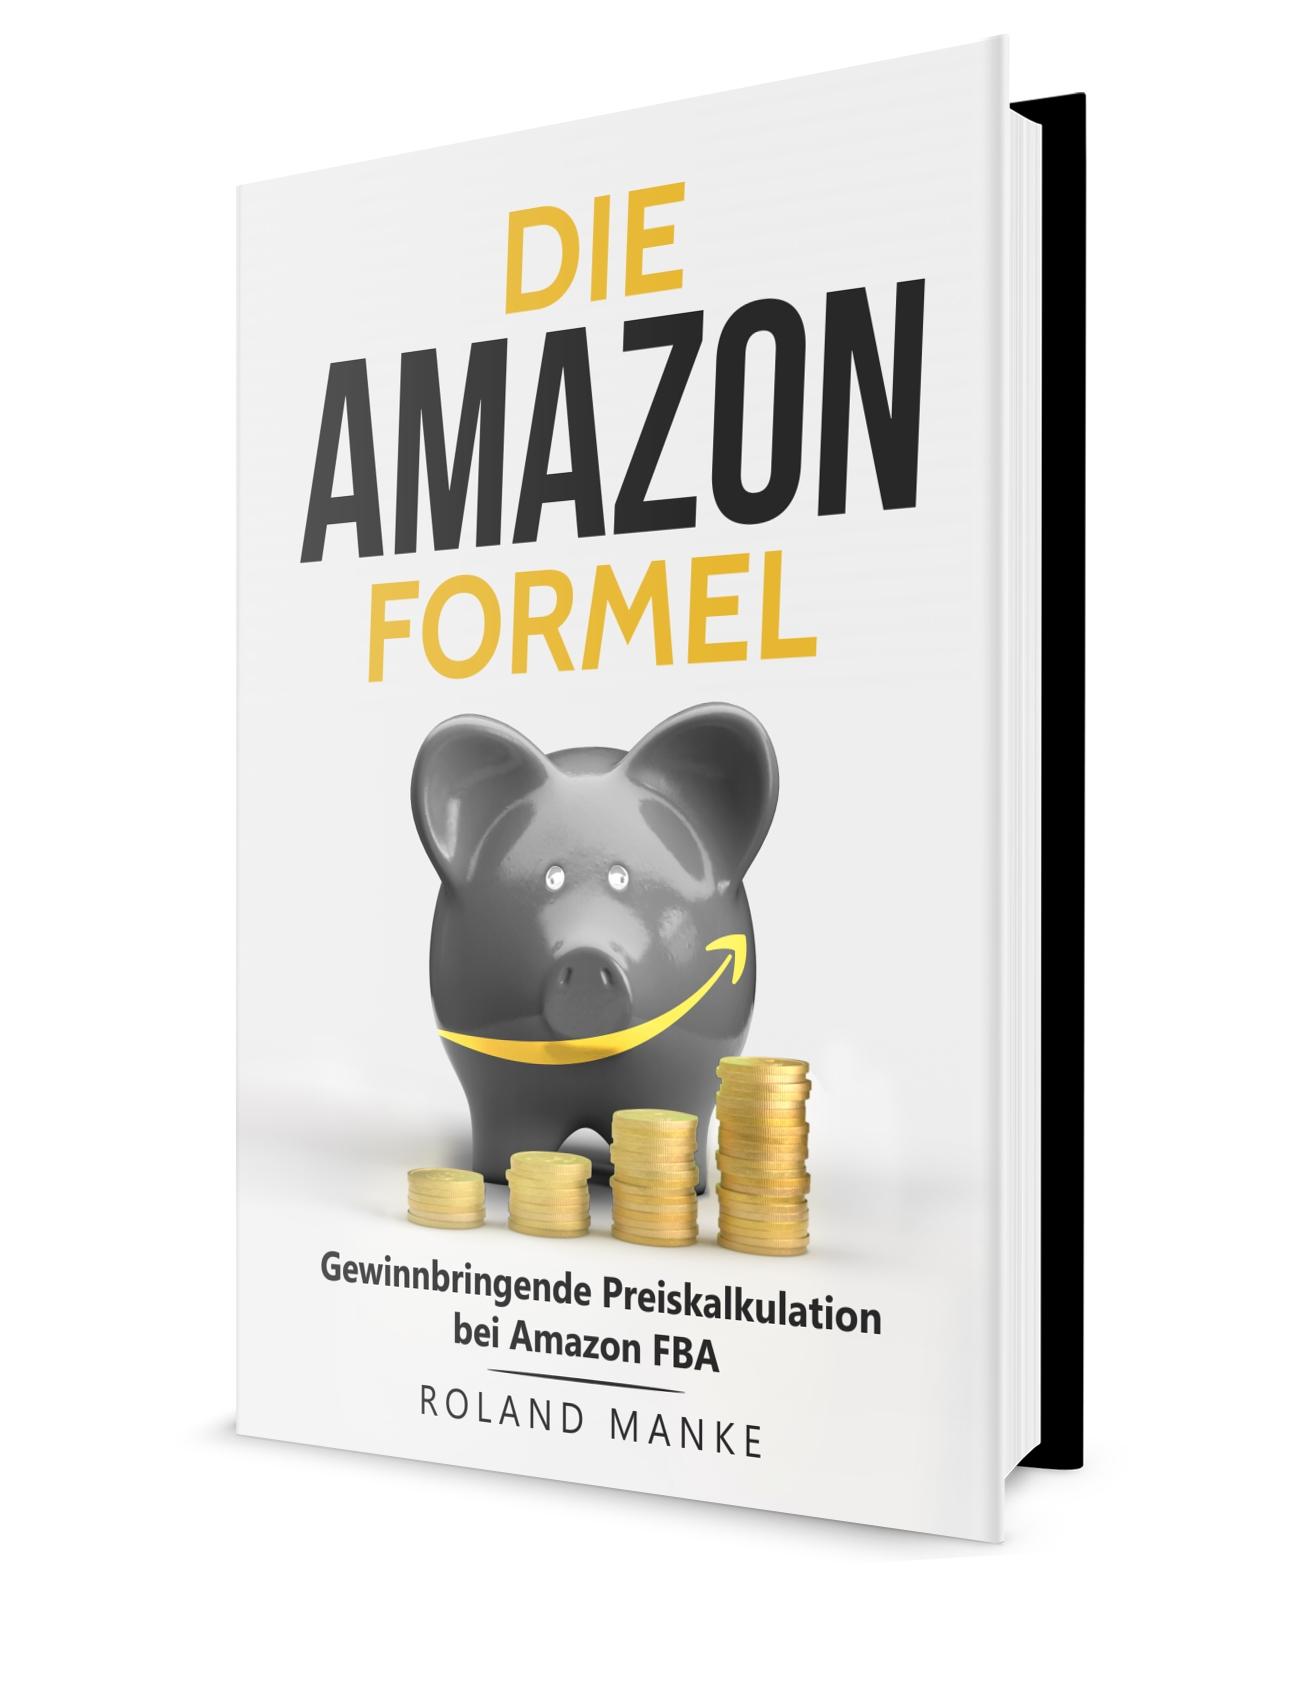 Amazon FBA Preise kalkulieren Buchhaltung